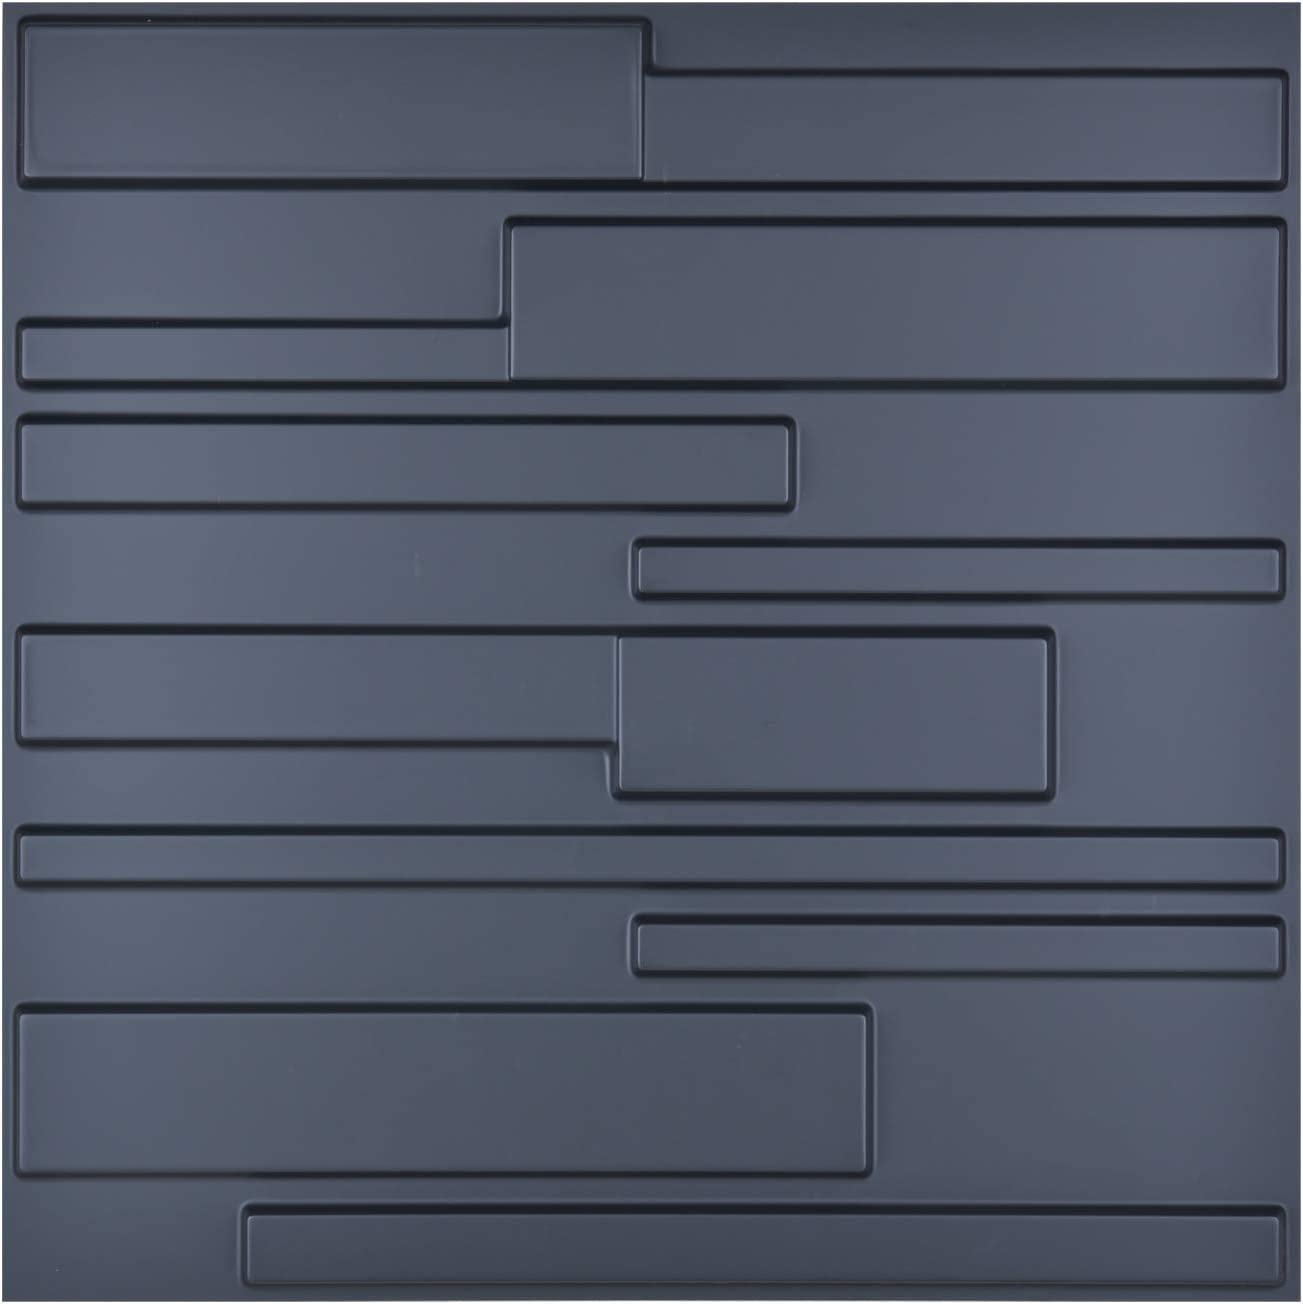 Art3d Matt Black 3D Wall Panel PVC Wall Block Cover 32 Sqft, for Interior Wall Décor in Living Room,Bedroom,Lobby,Office,Shopping Mall